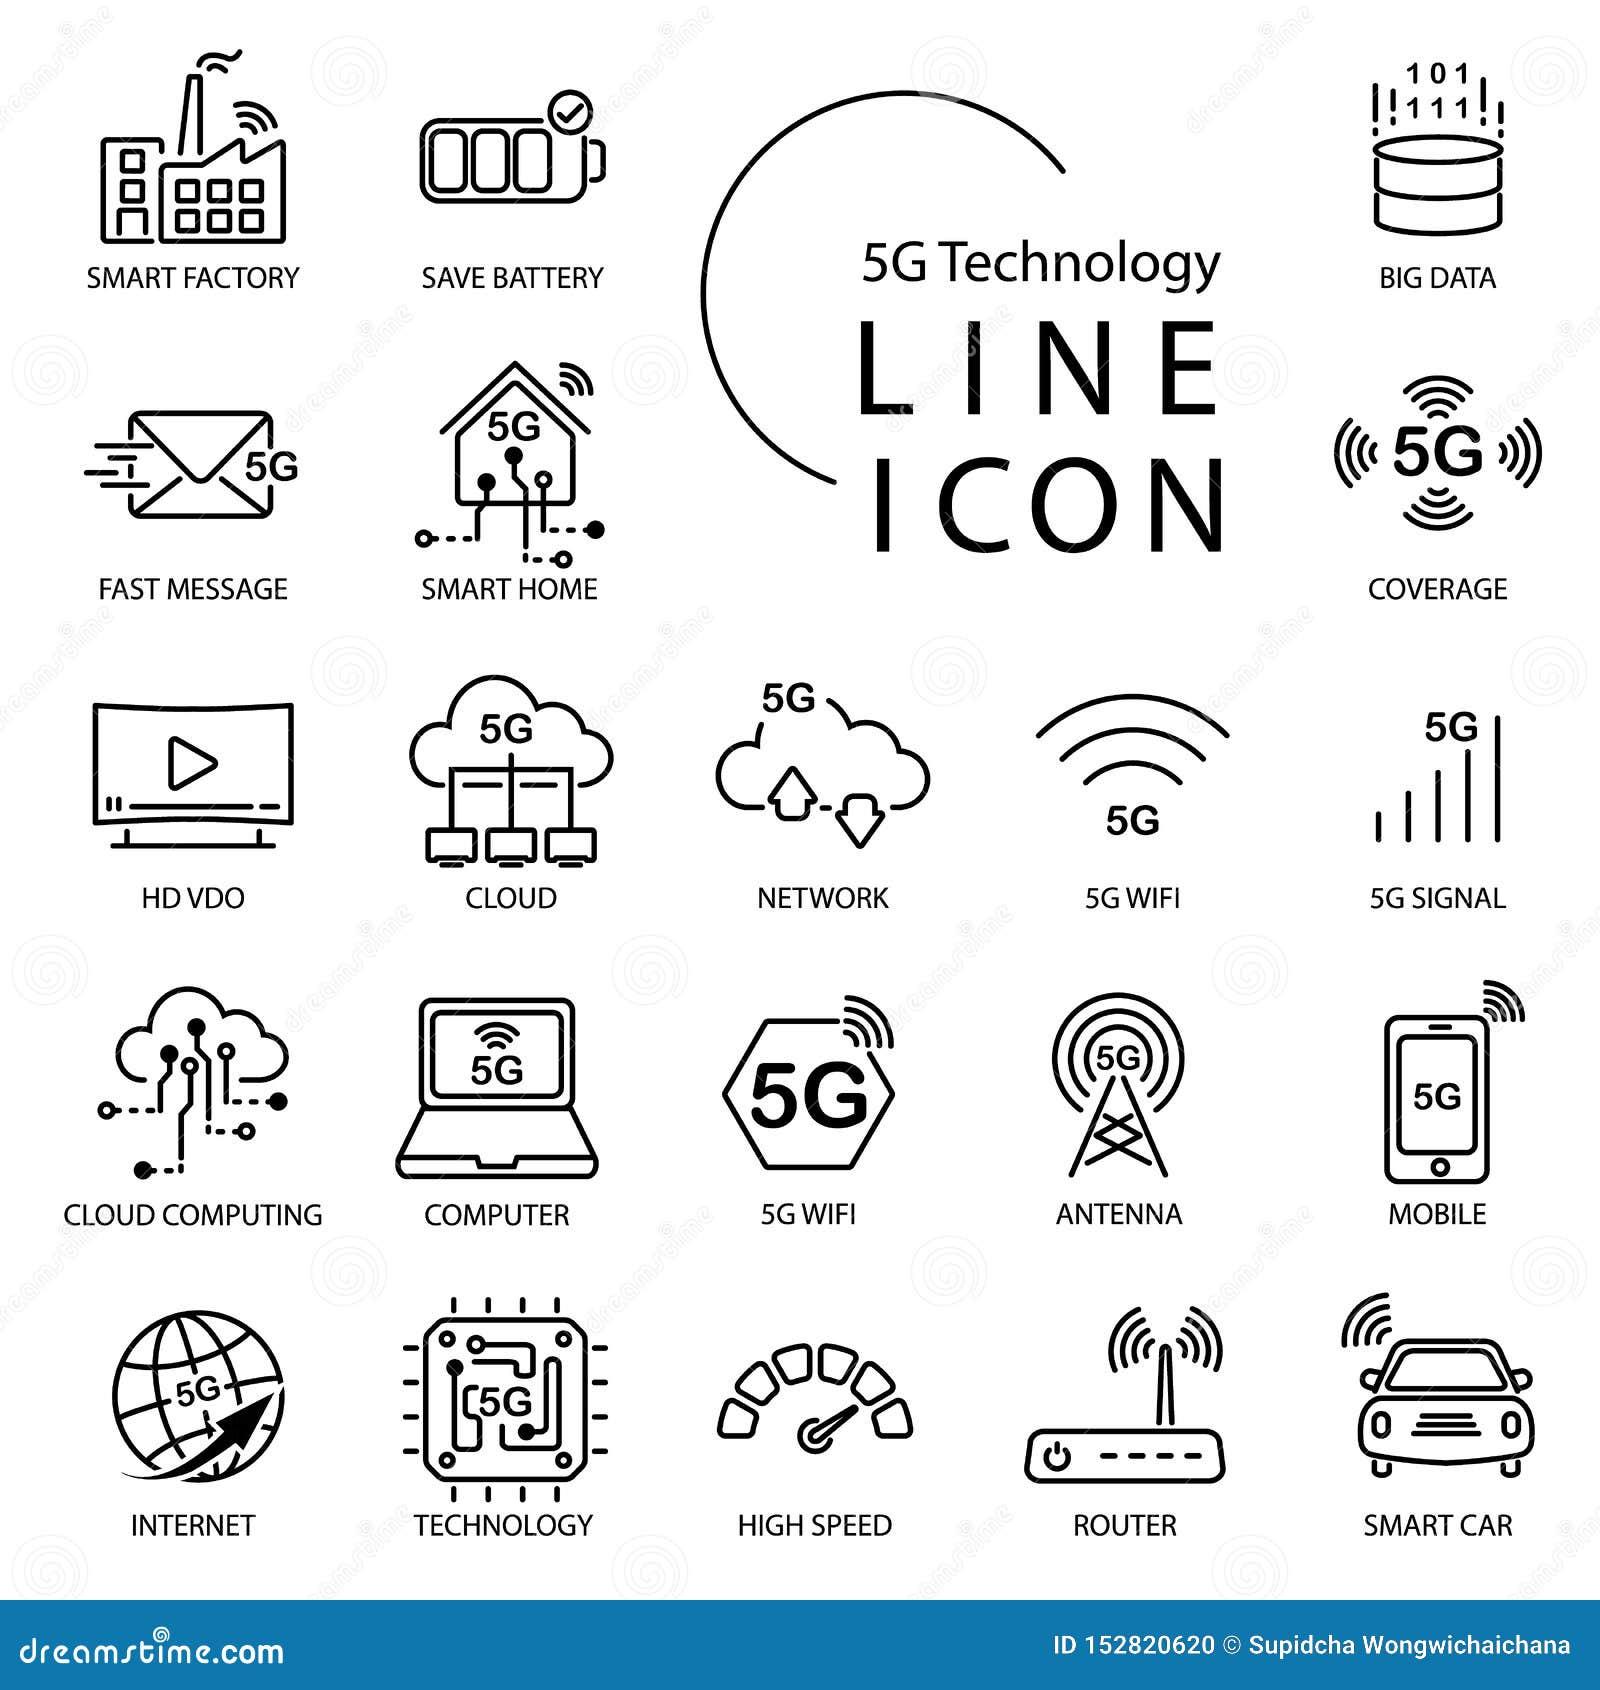 Eenvoudig lijnpictogram over 5G, Internet van thingsIOTtechnologie Omvat slimme huis, wifi, netwerk, wolk en meer